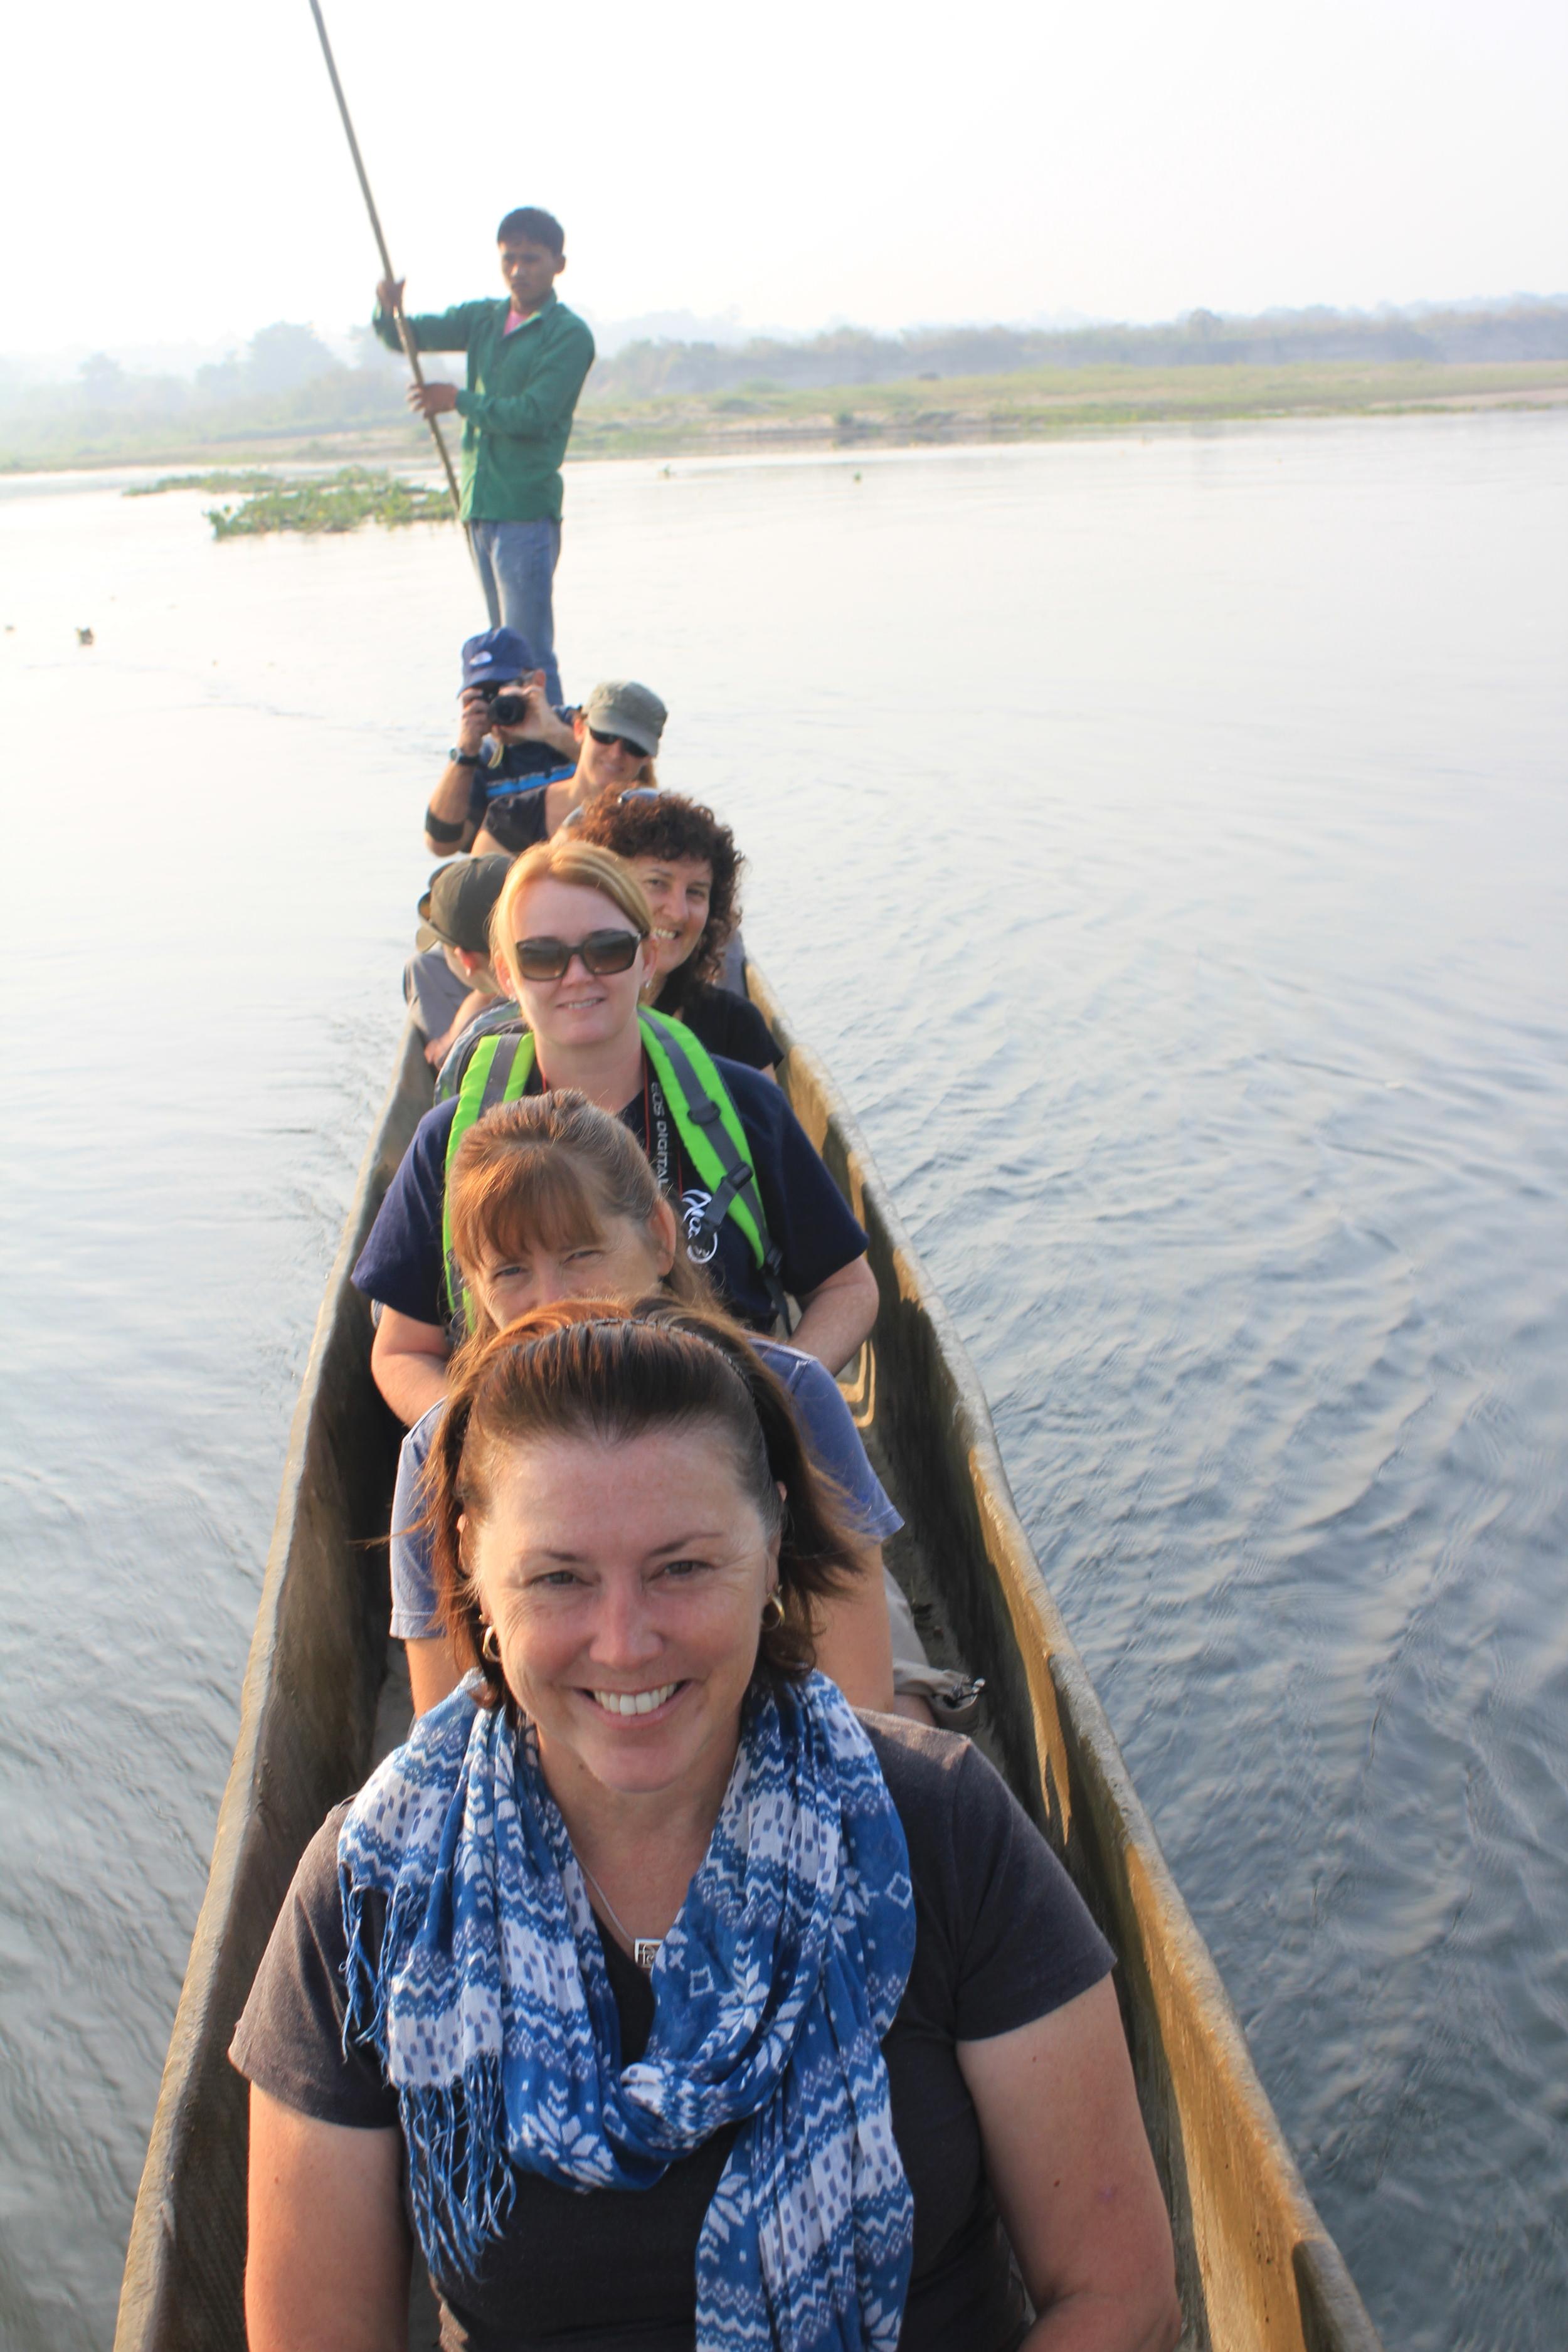 Feelingvulnerable in a very small canoe